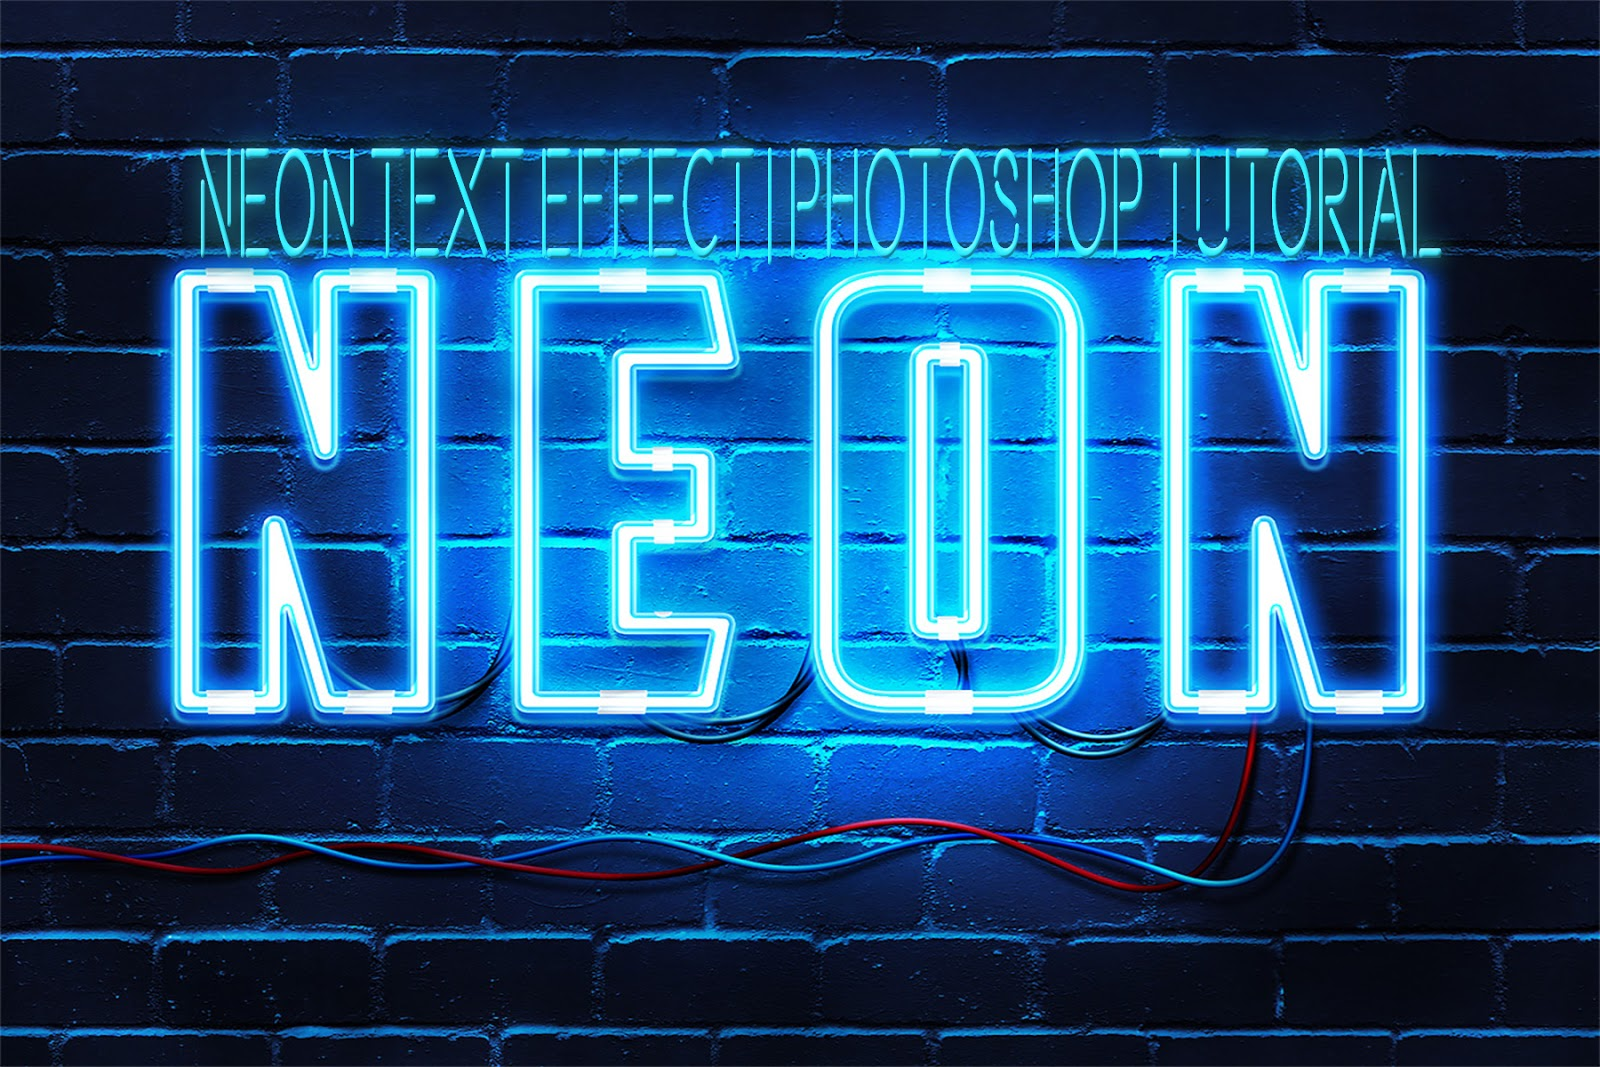 NEON TEXT Effect | Photoshop Tutorial - PIXEL BUCKETZ